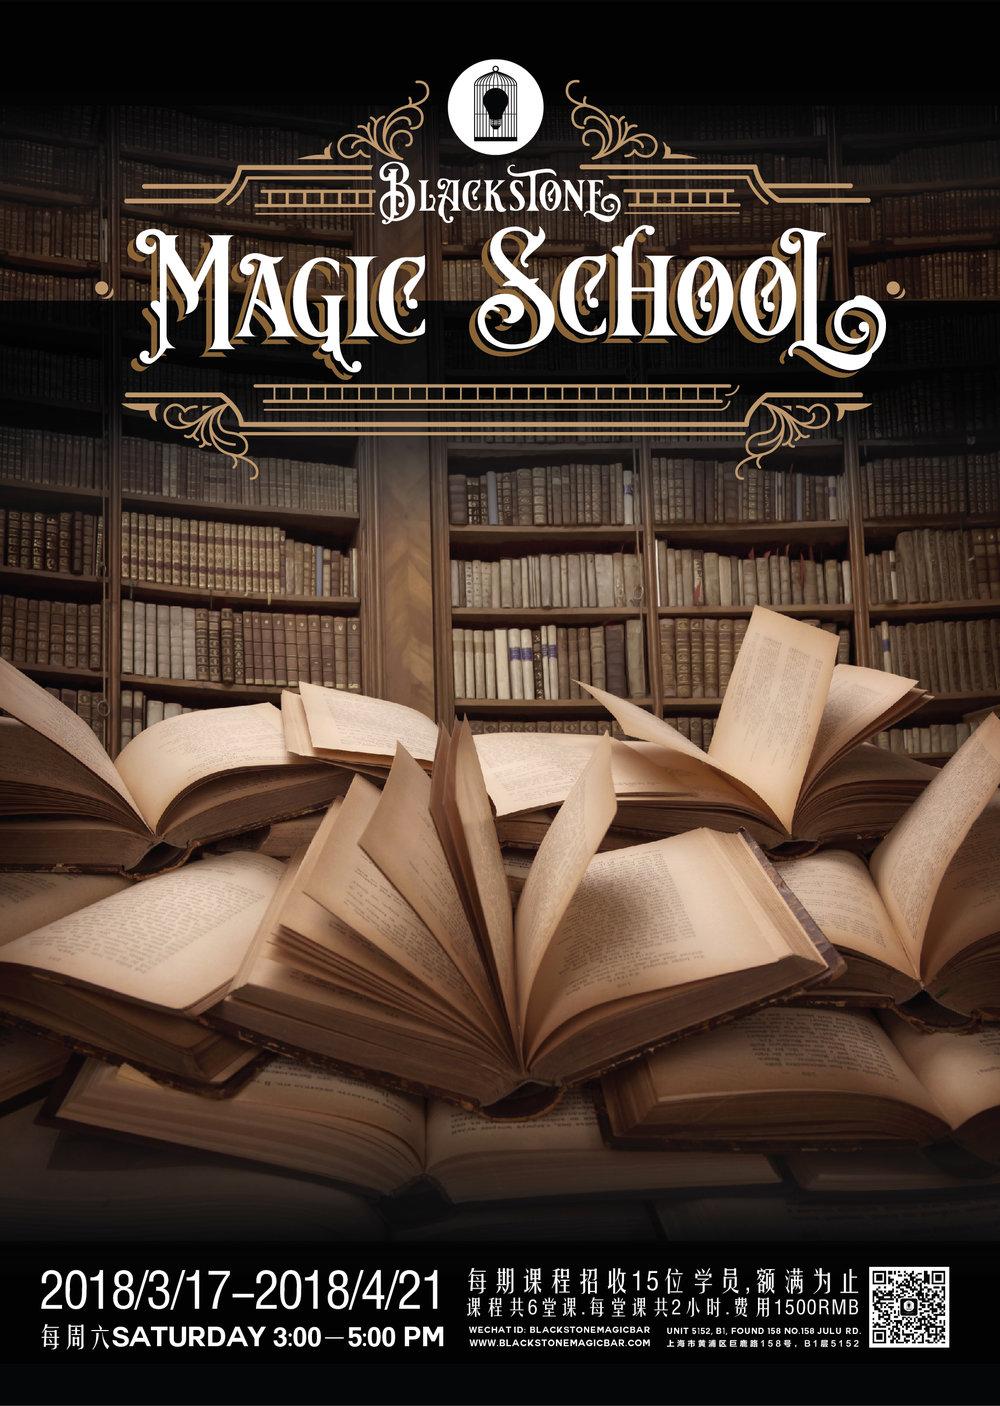 Blackstone Magic School